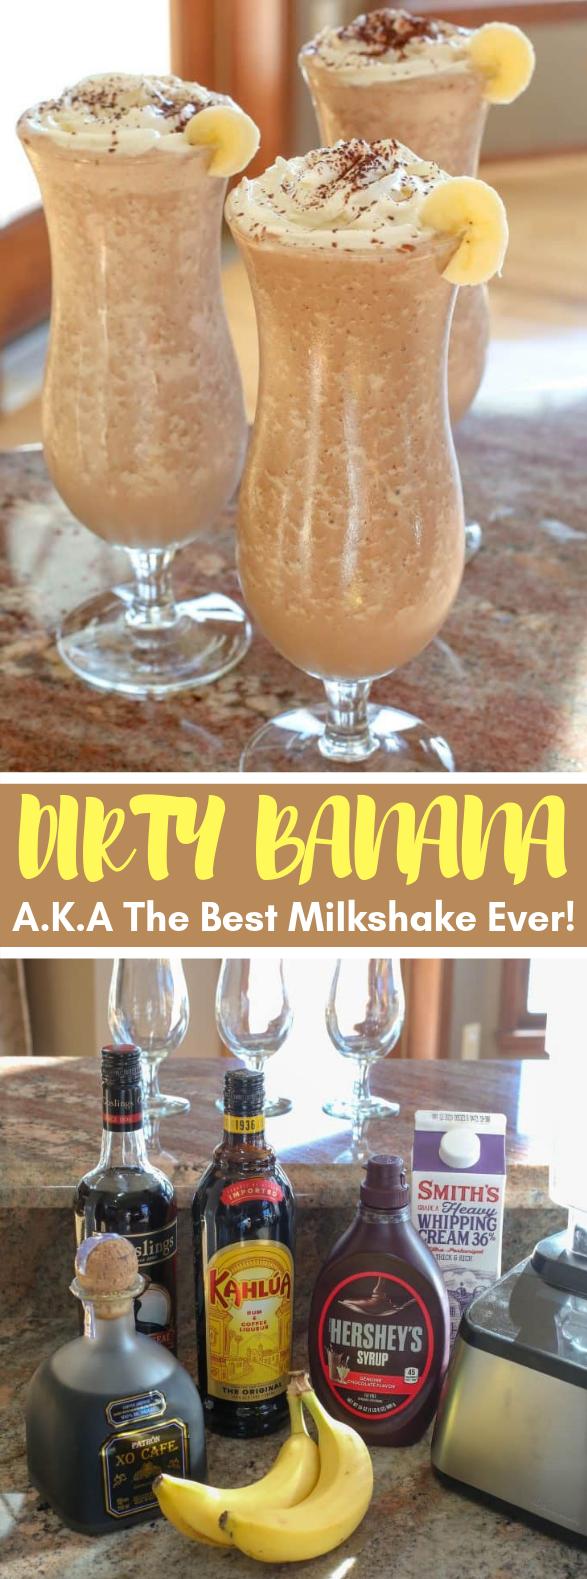 The Dirty Banana